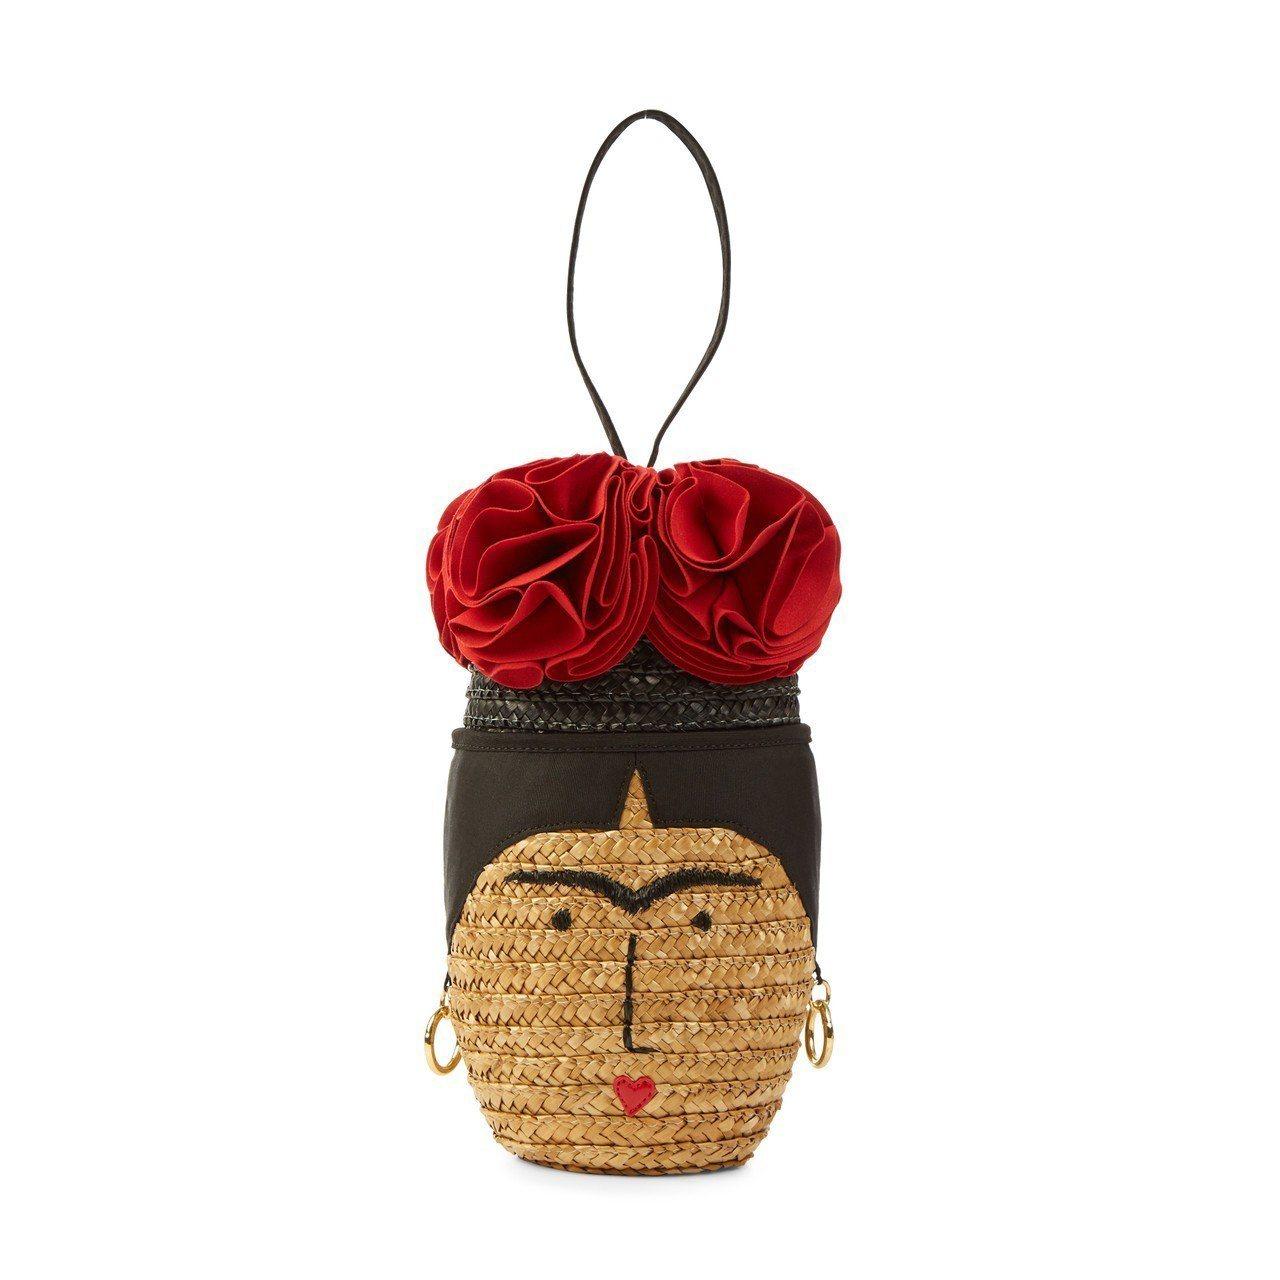 Frida系列花籃手腕包,13,800元。圖/Lulu Guinness提供